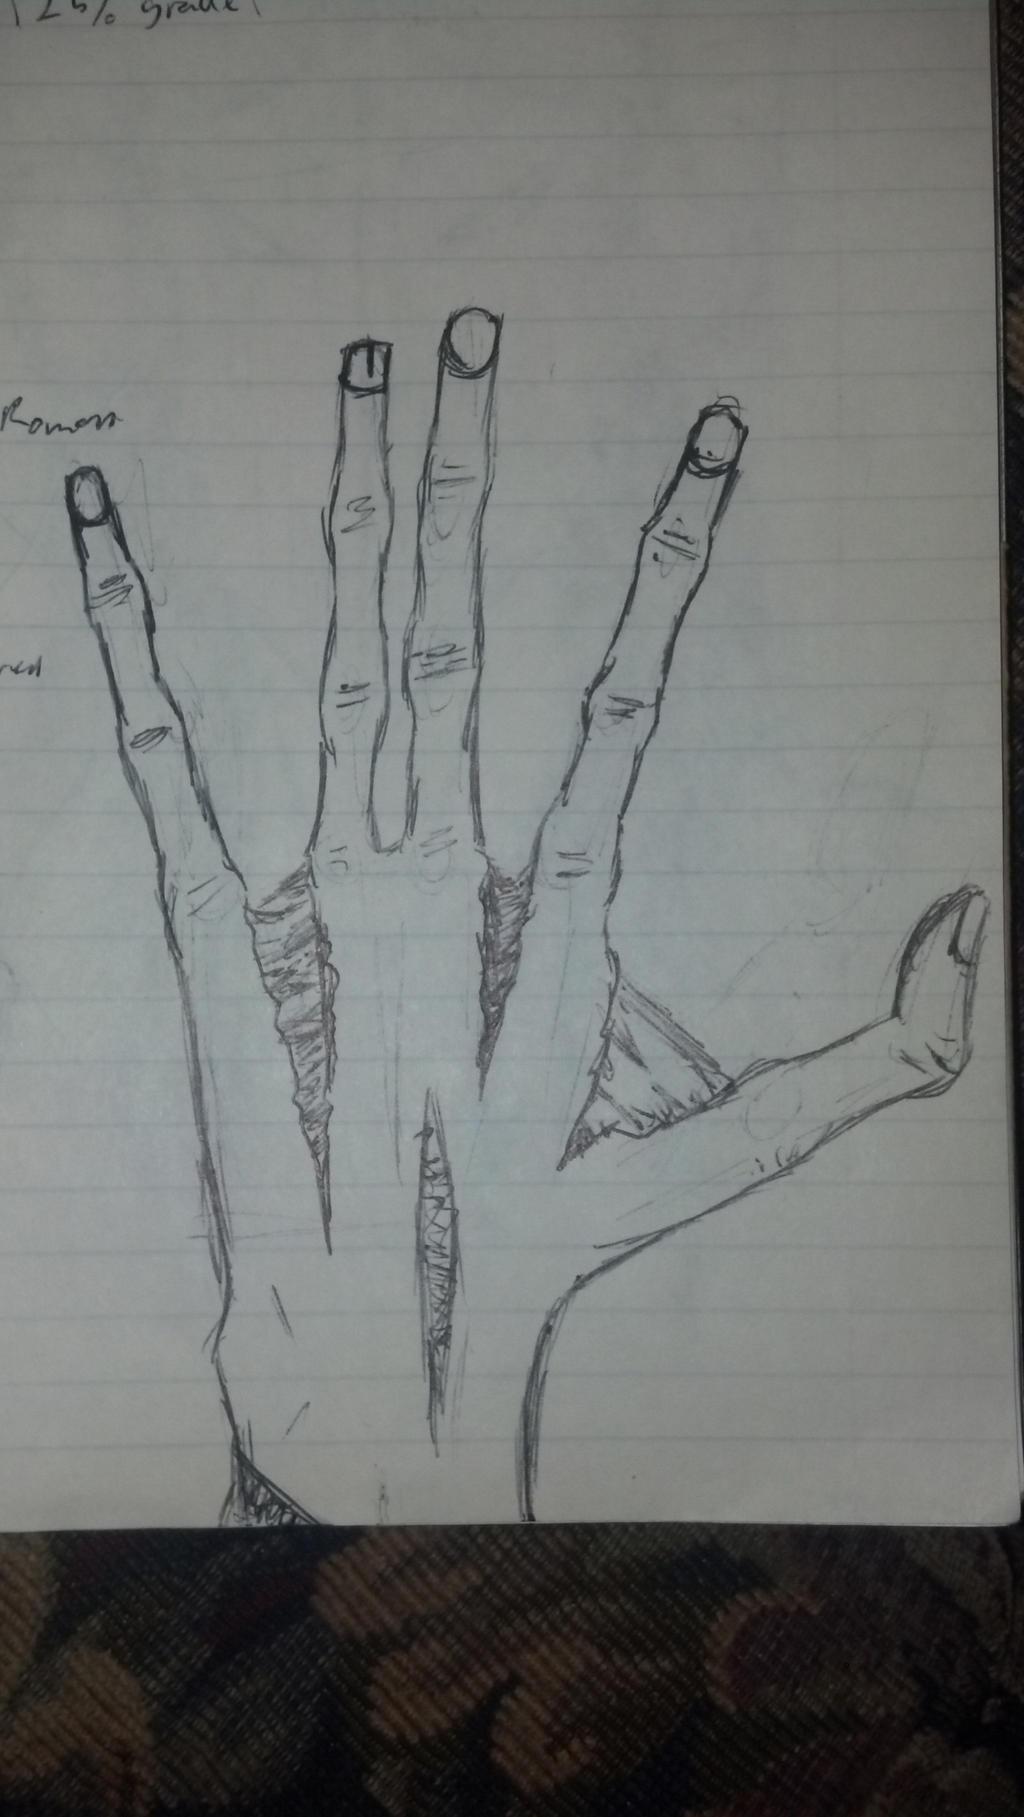 Splitting Hand by Yxanr